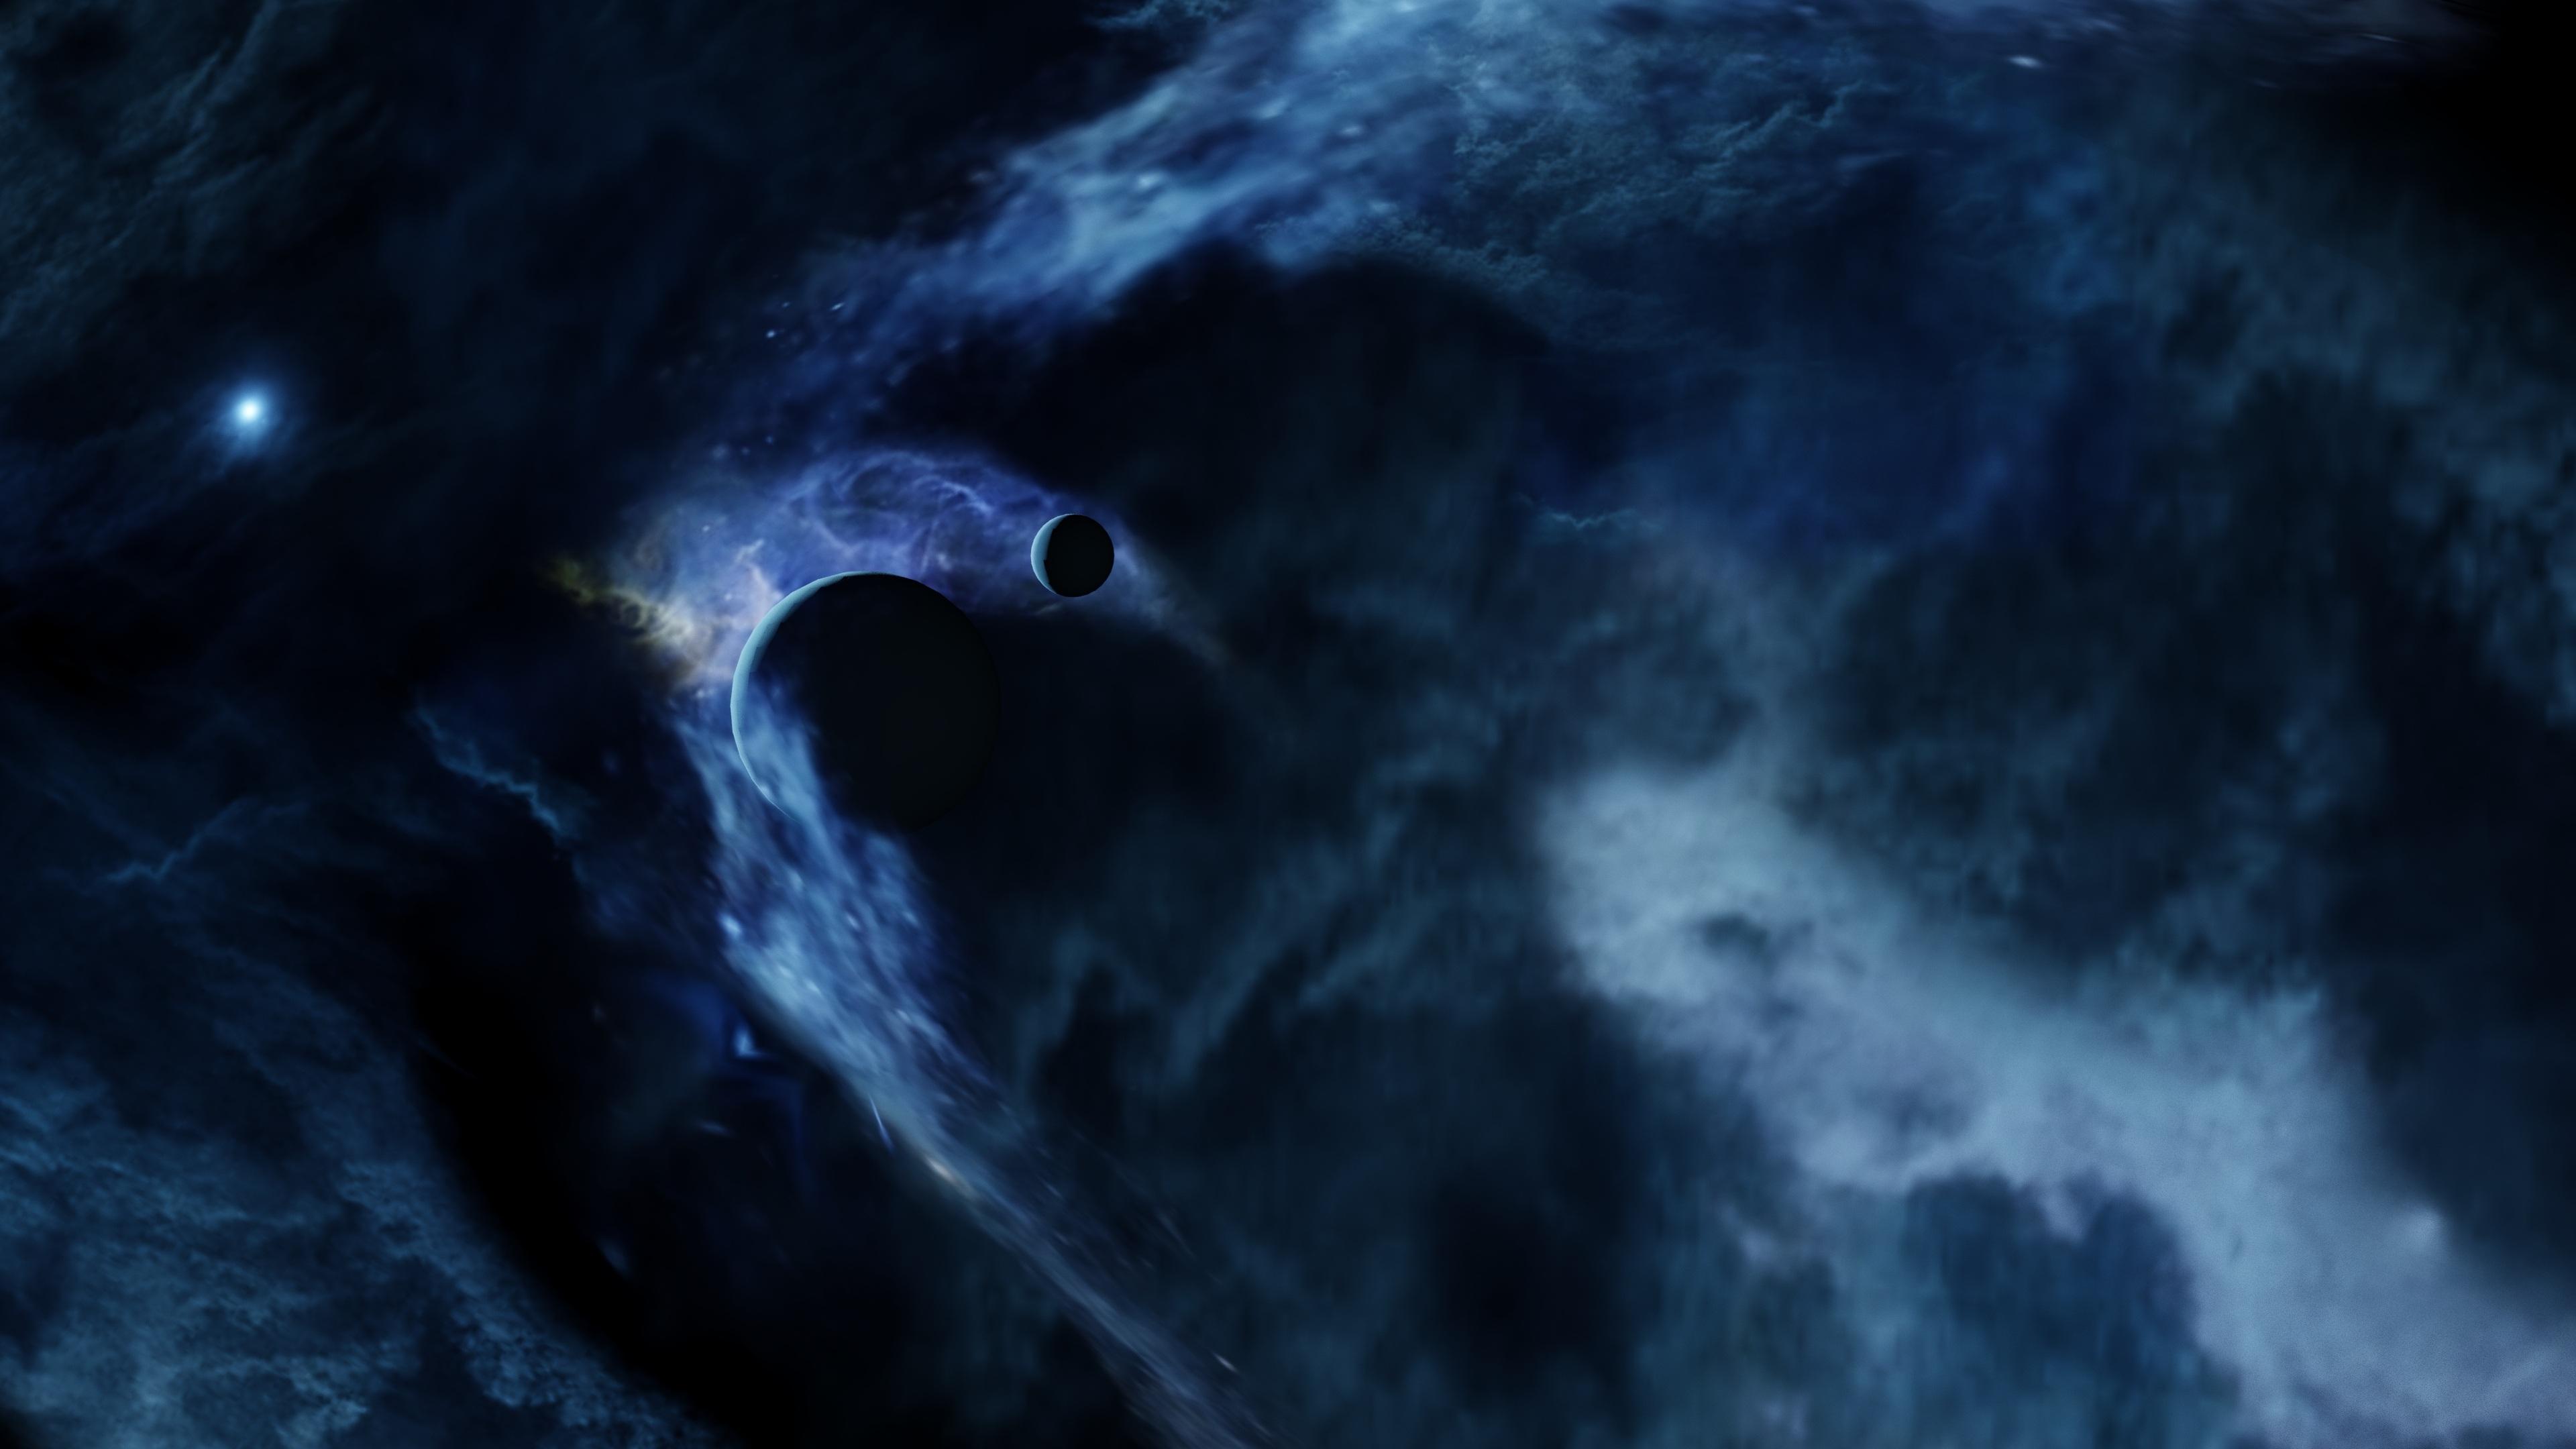 Blue Nebula 4K UHD Wallpaper | Wallpapers.gg Blue Nebula Wallpaper Widescreen